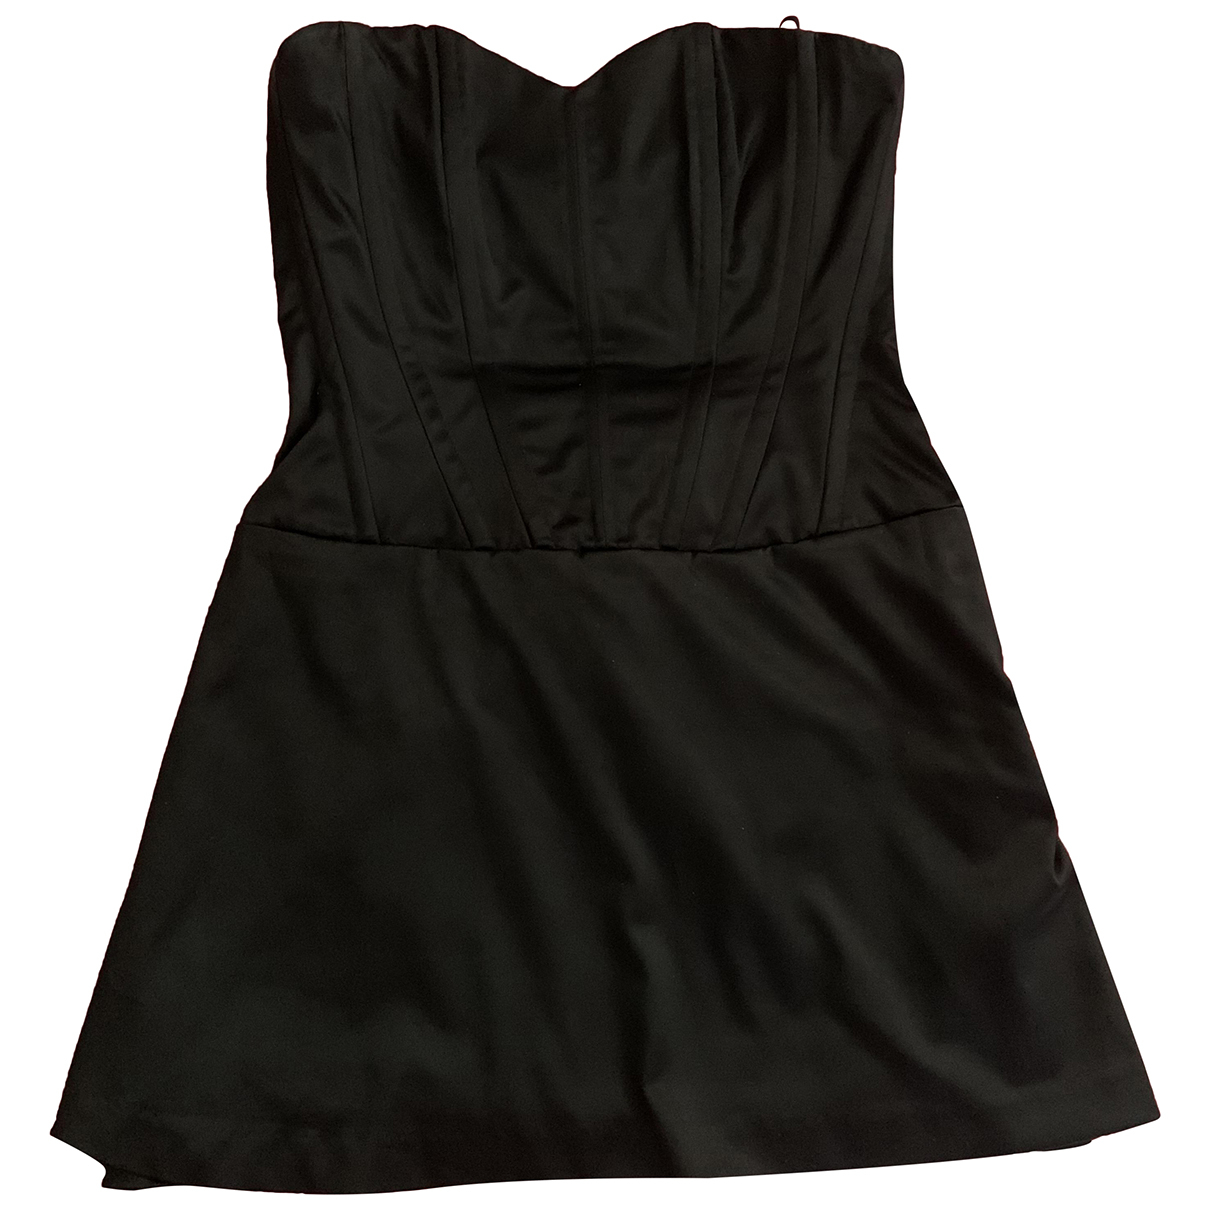 Manoush \N Kleid in  Schwarz Baumwolle - Elasthan